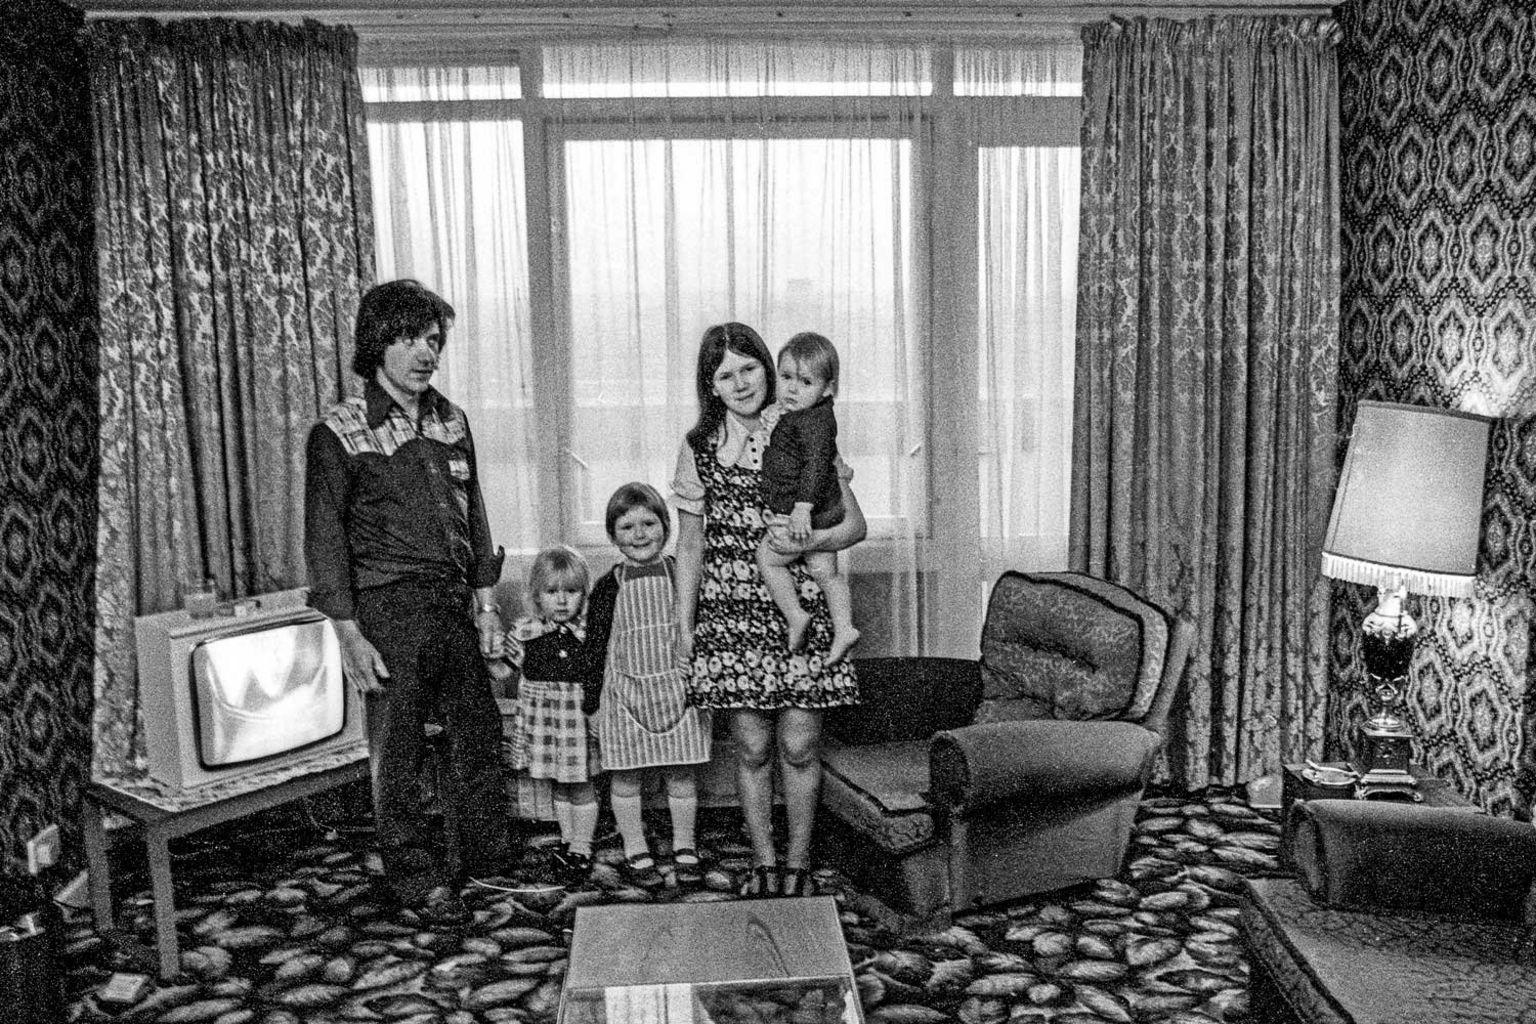 Rachel Point, Nightingale Estate, 1974